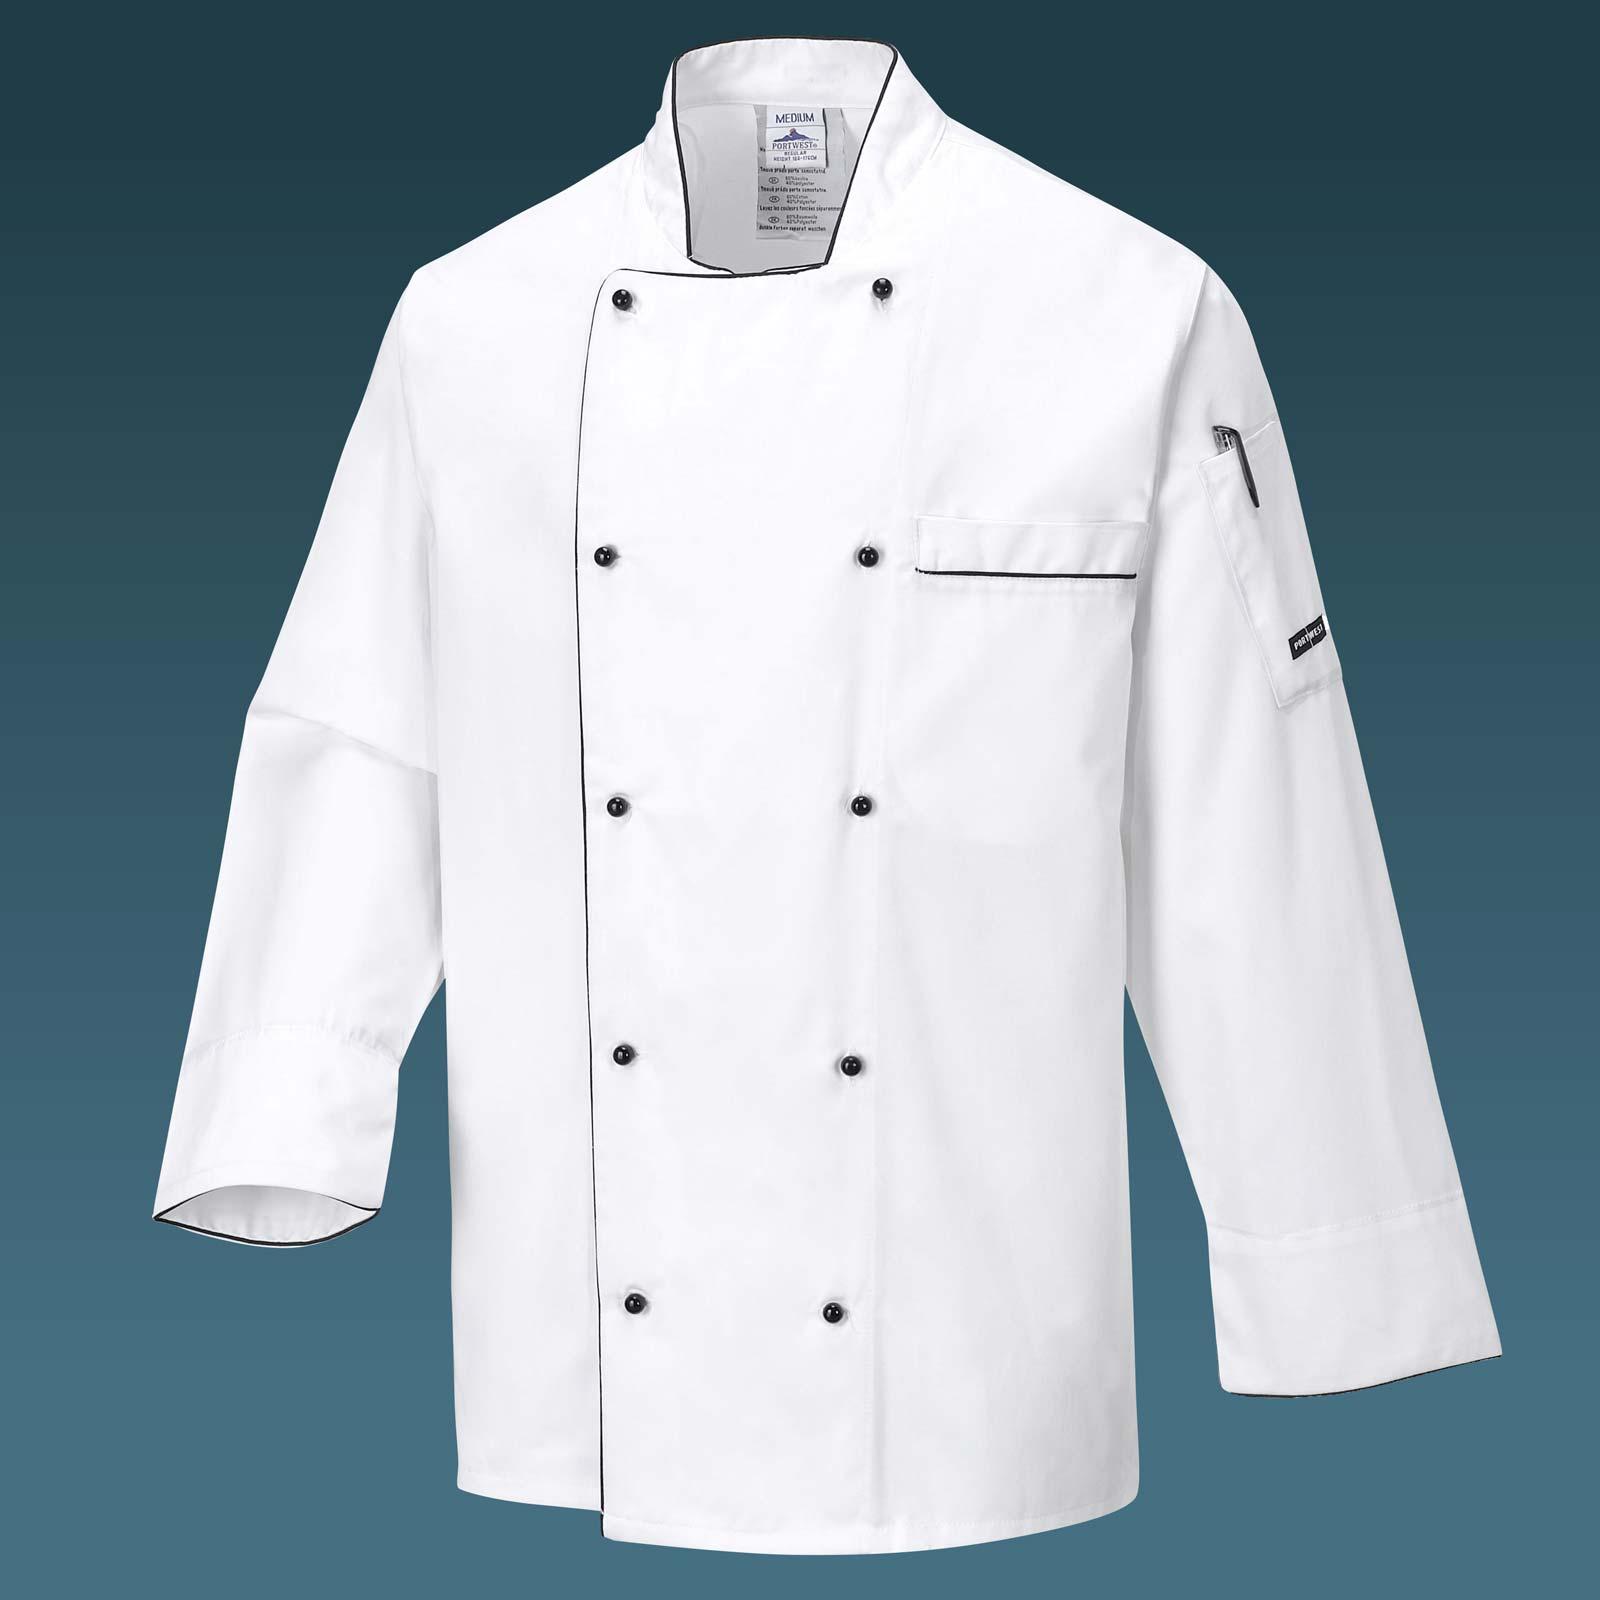 Executive Chefs Jacket - C776